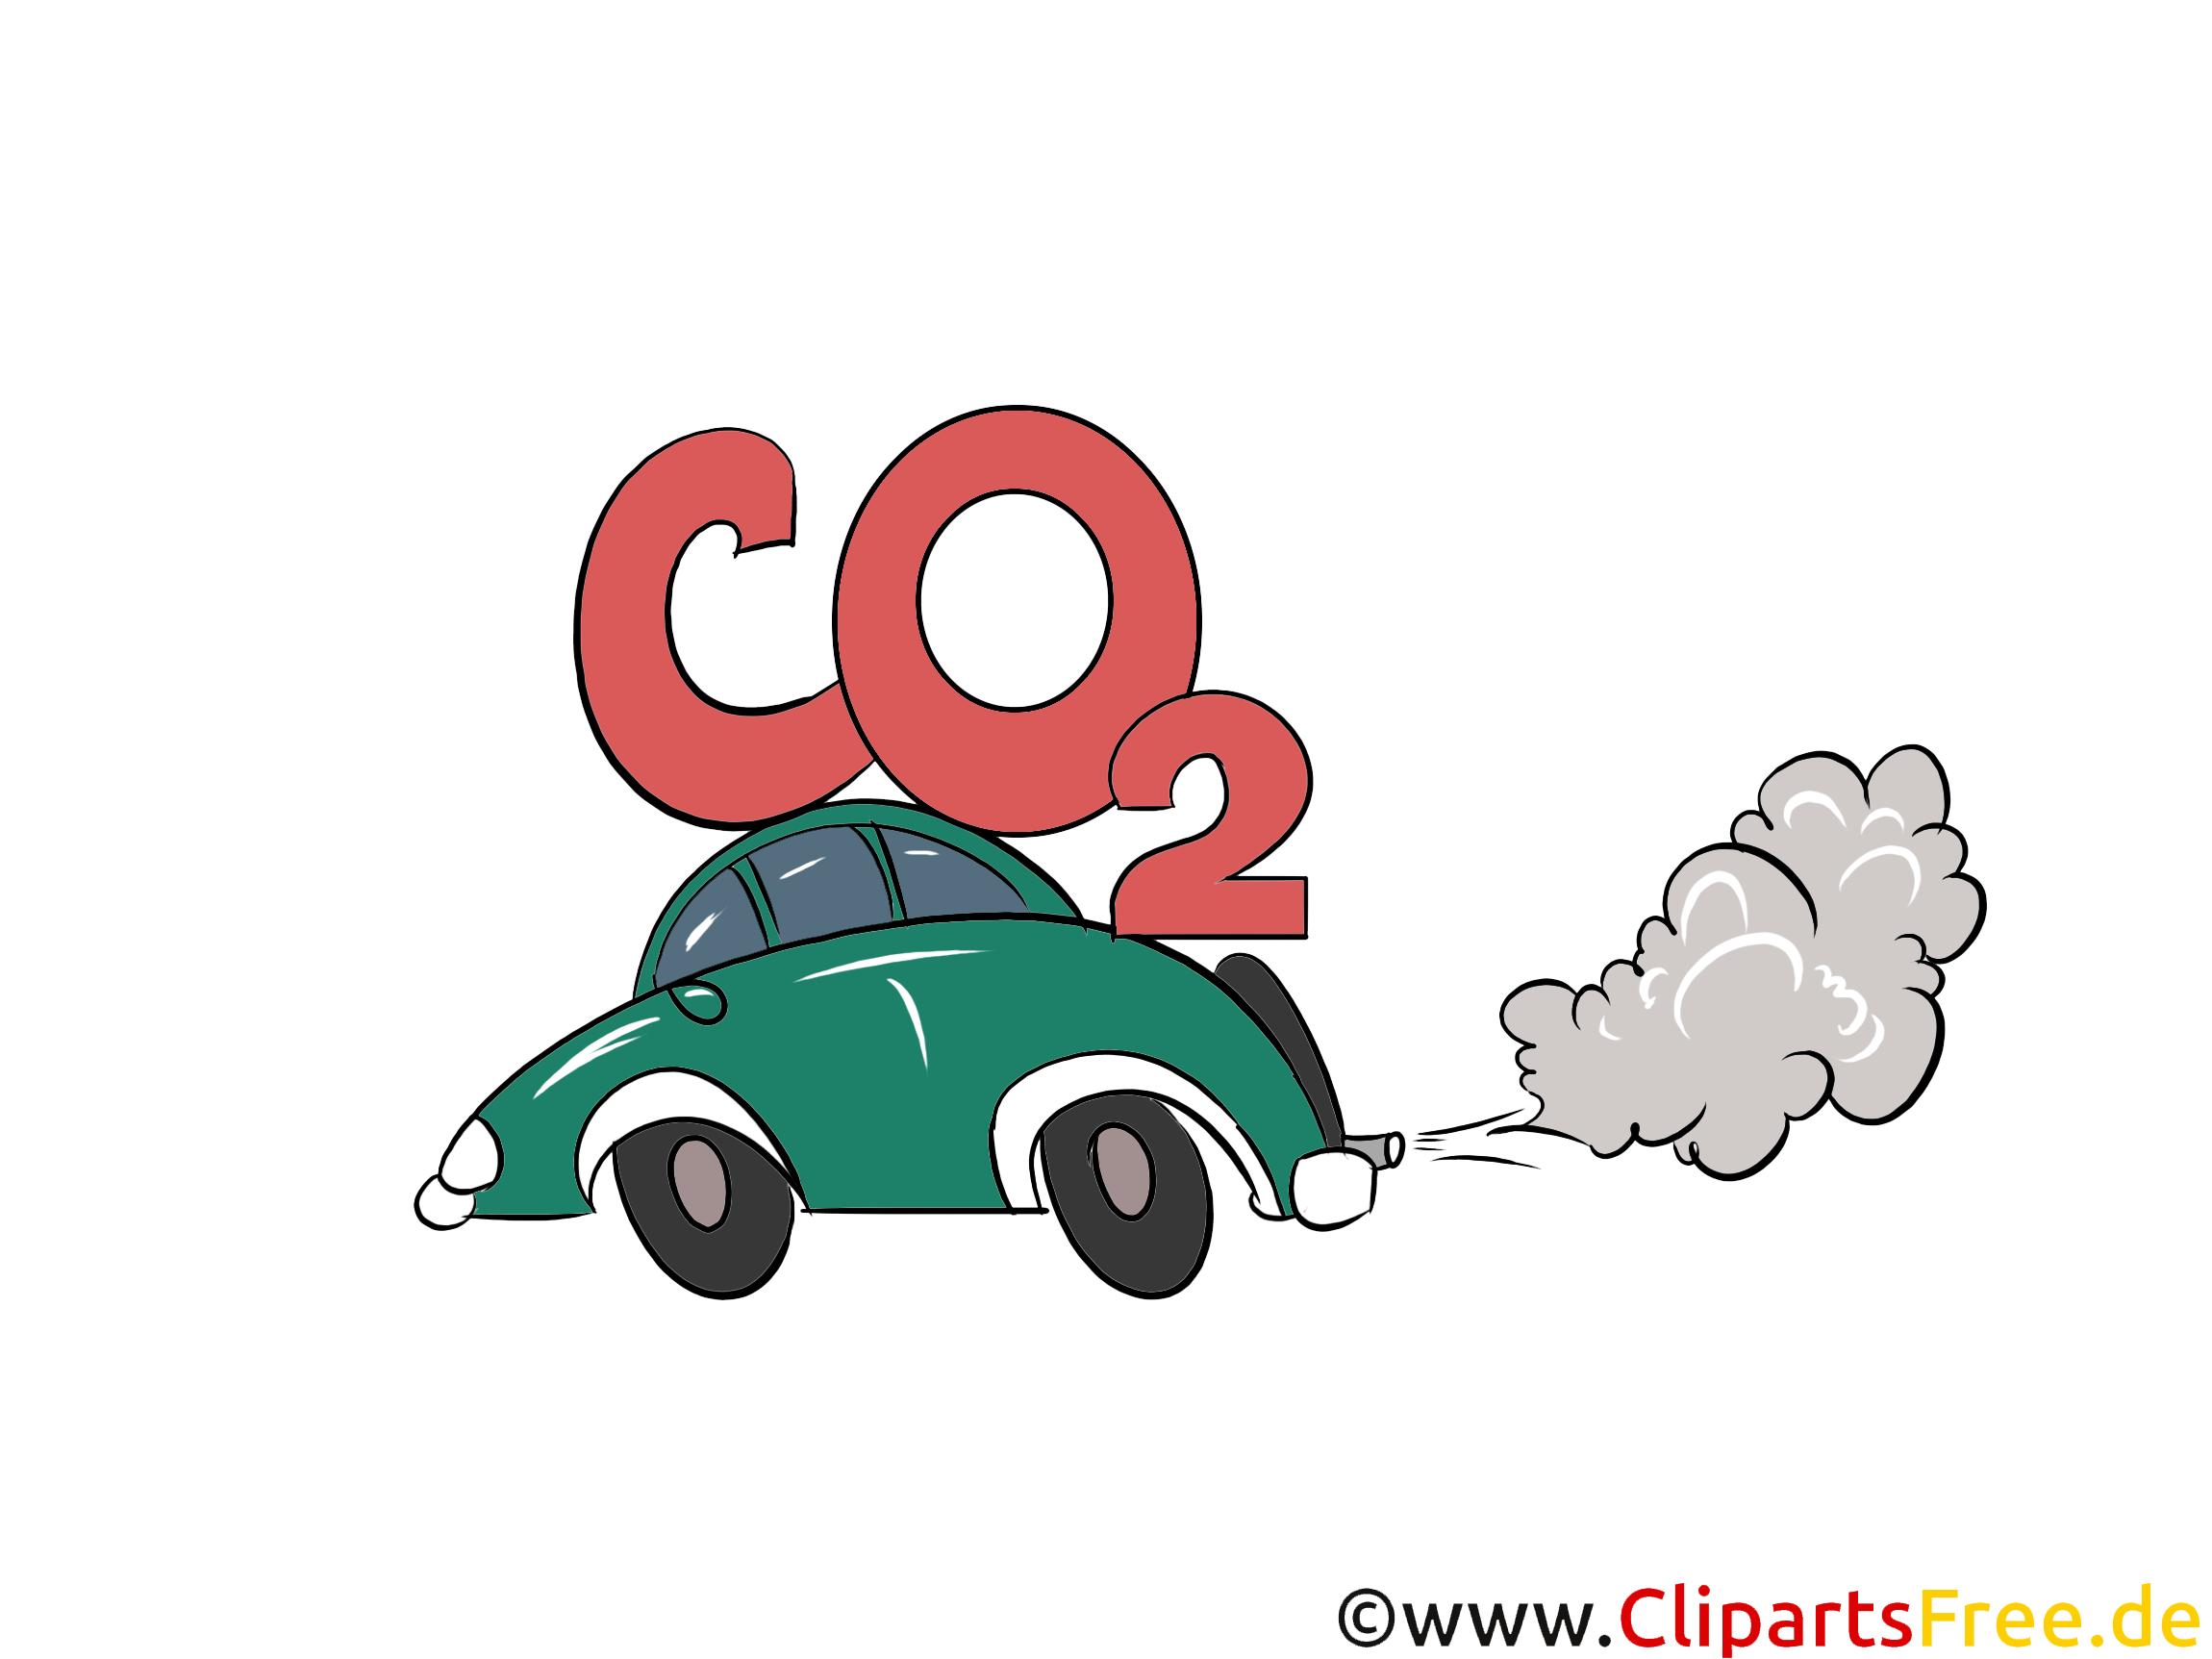 CO2 Ausstoß bei Autos Illustration, Bild, Grafik